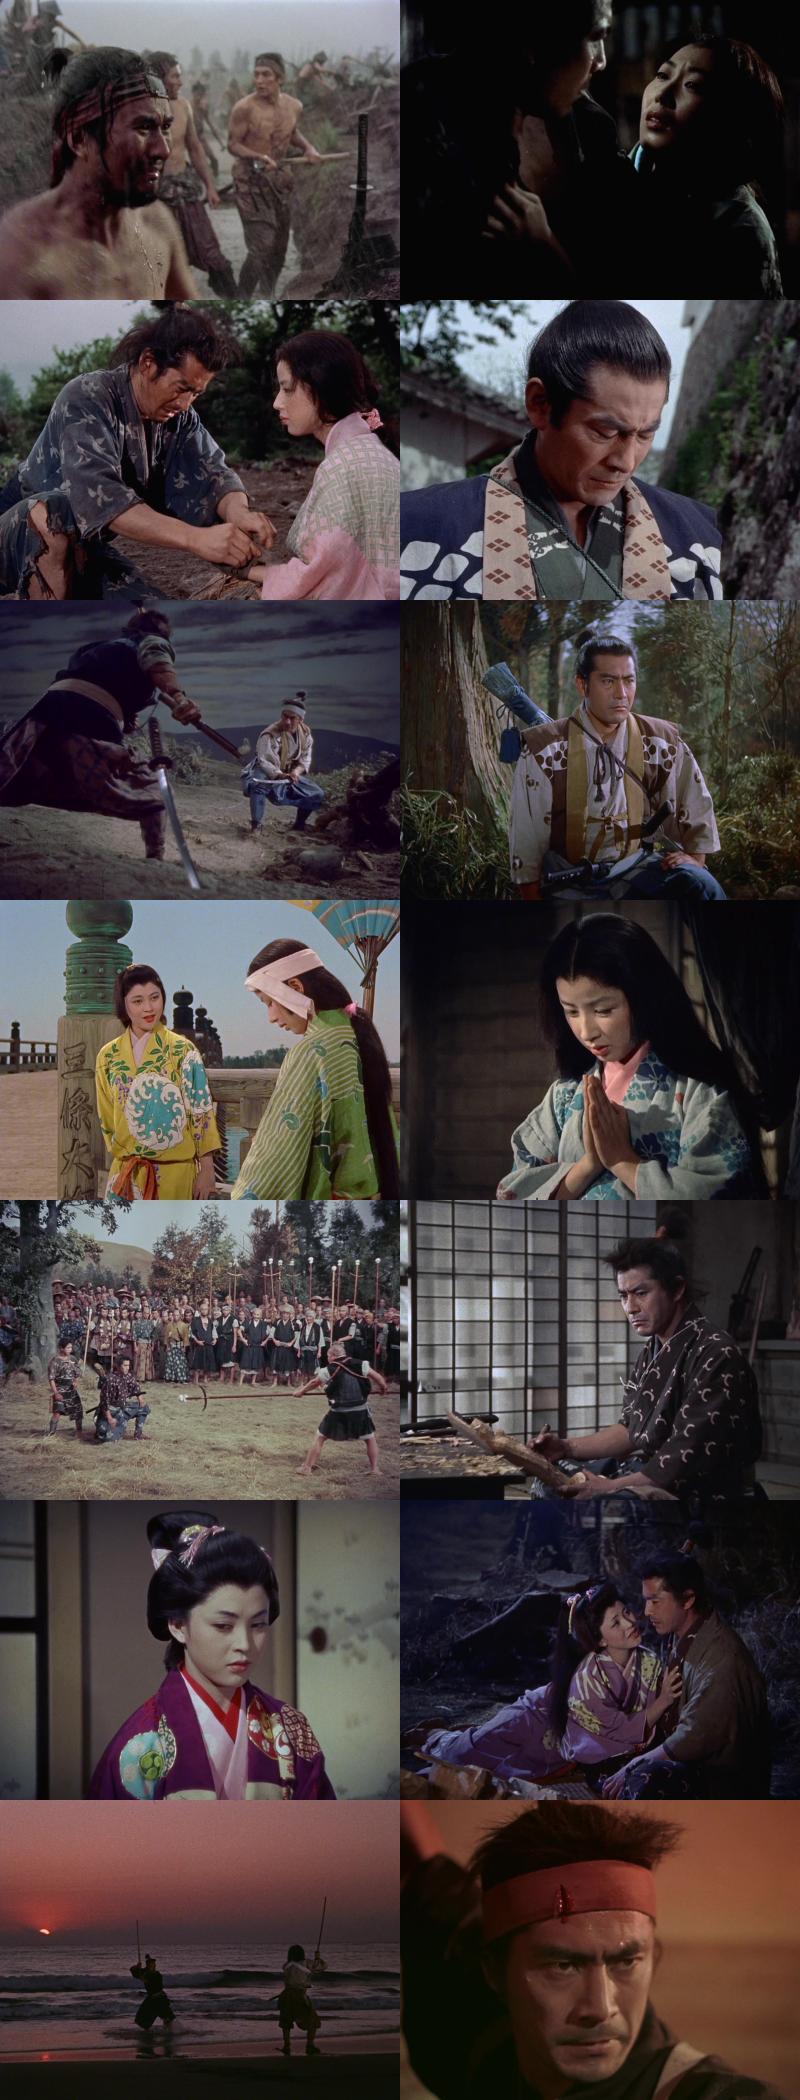 http://watershade.net/public/samurai-trilogy.jpg